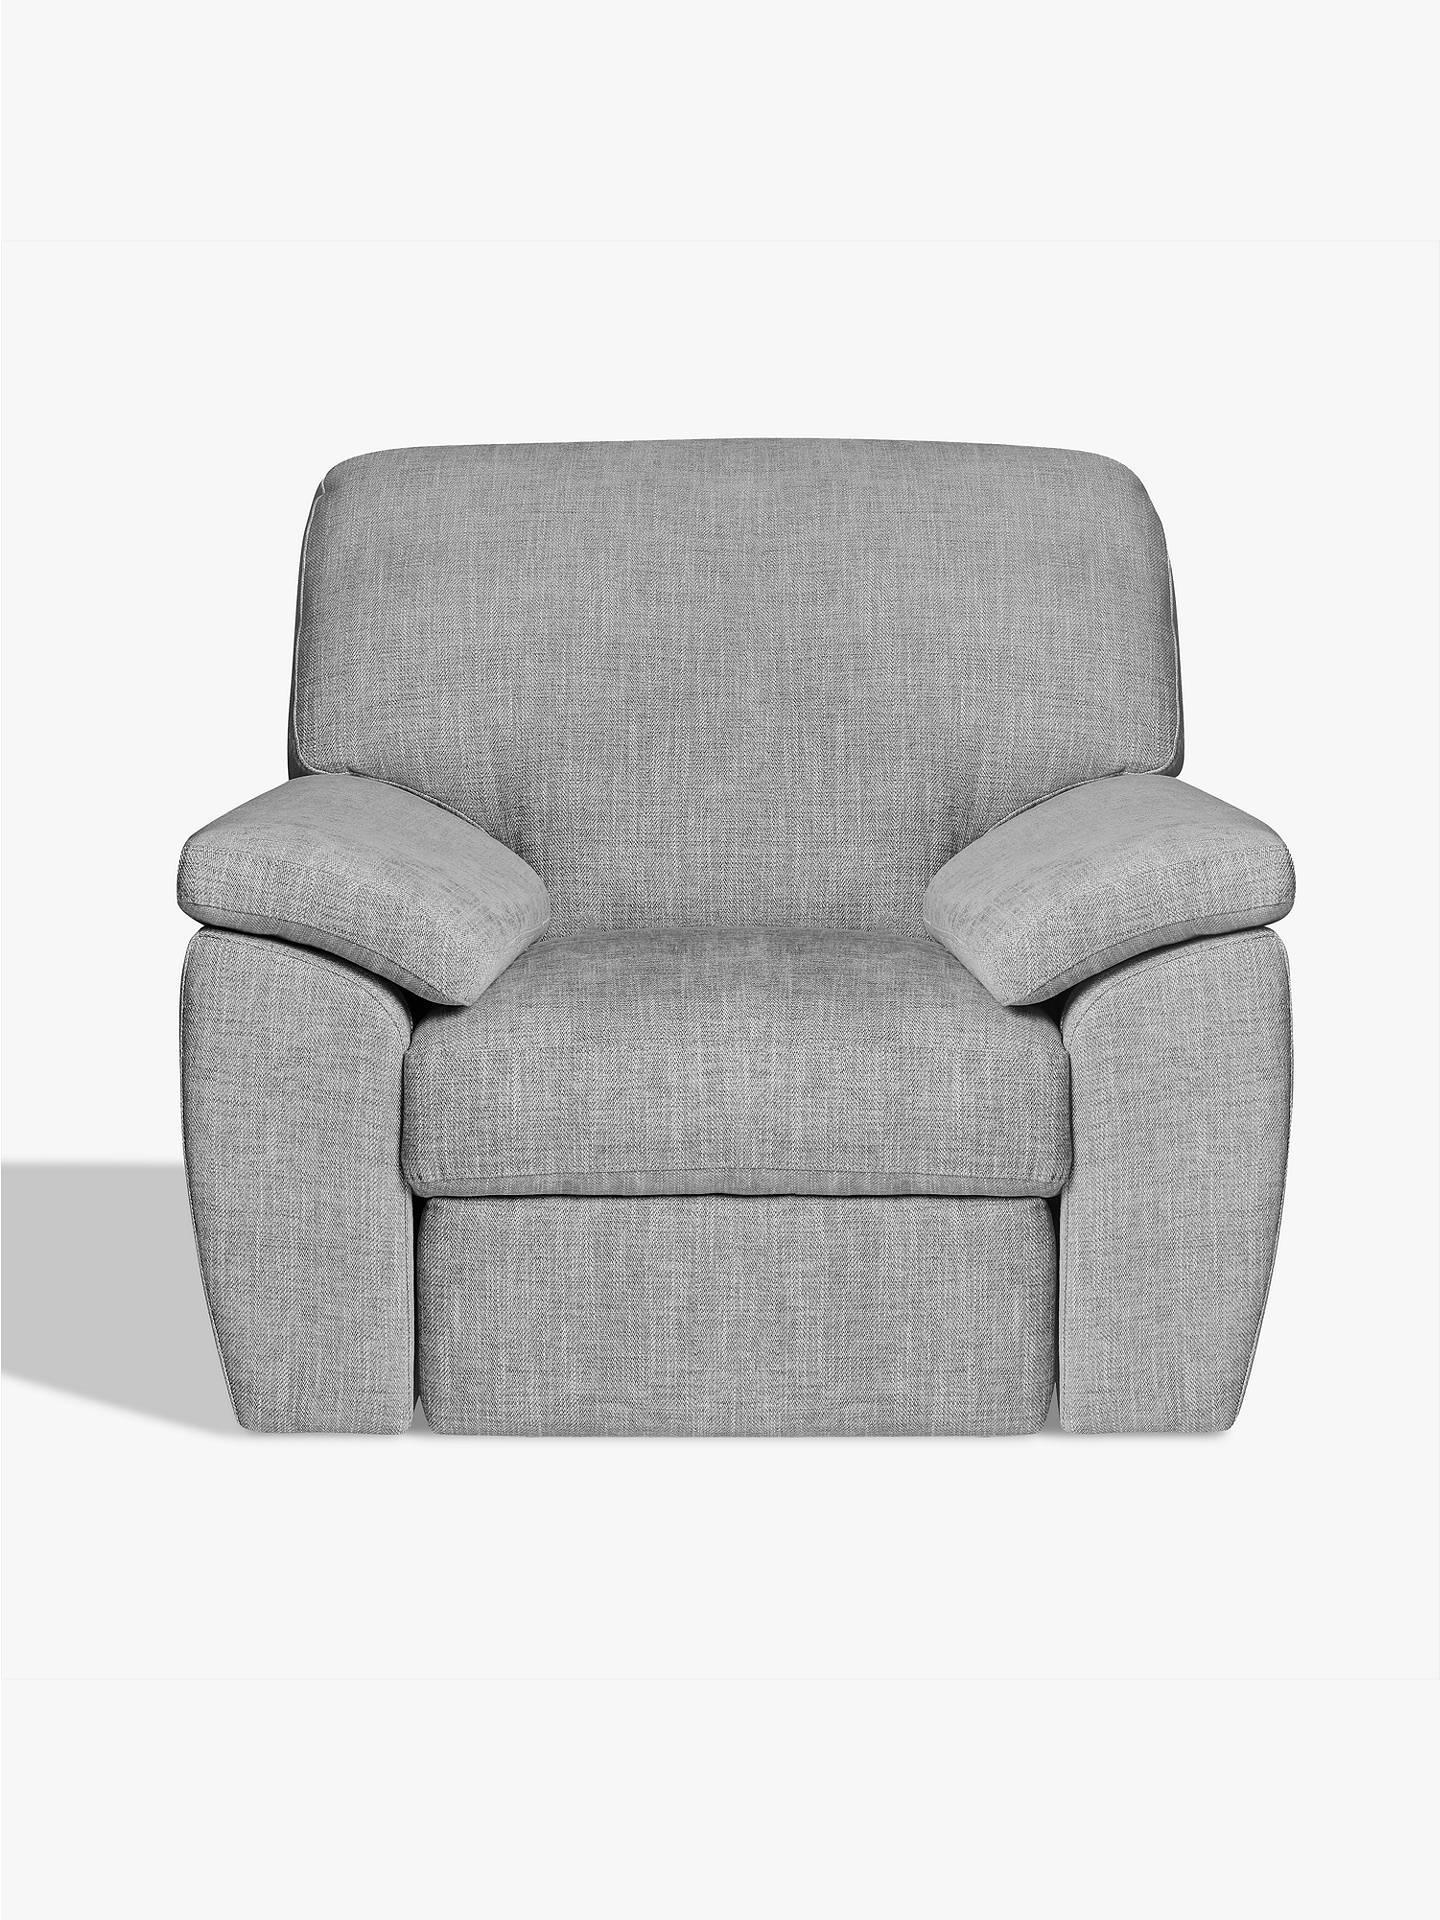 Terrific John Lewis Partners Camden Manual Reclining Chair Short Links Chair Design For Home Short Linksinfo